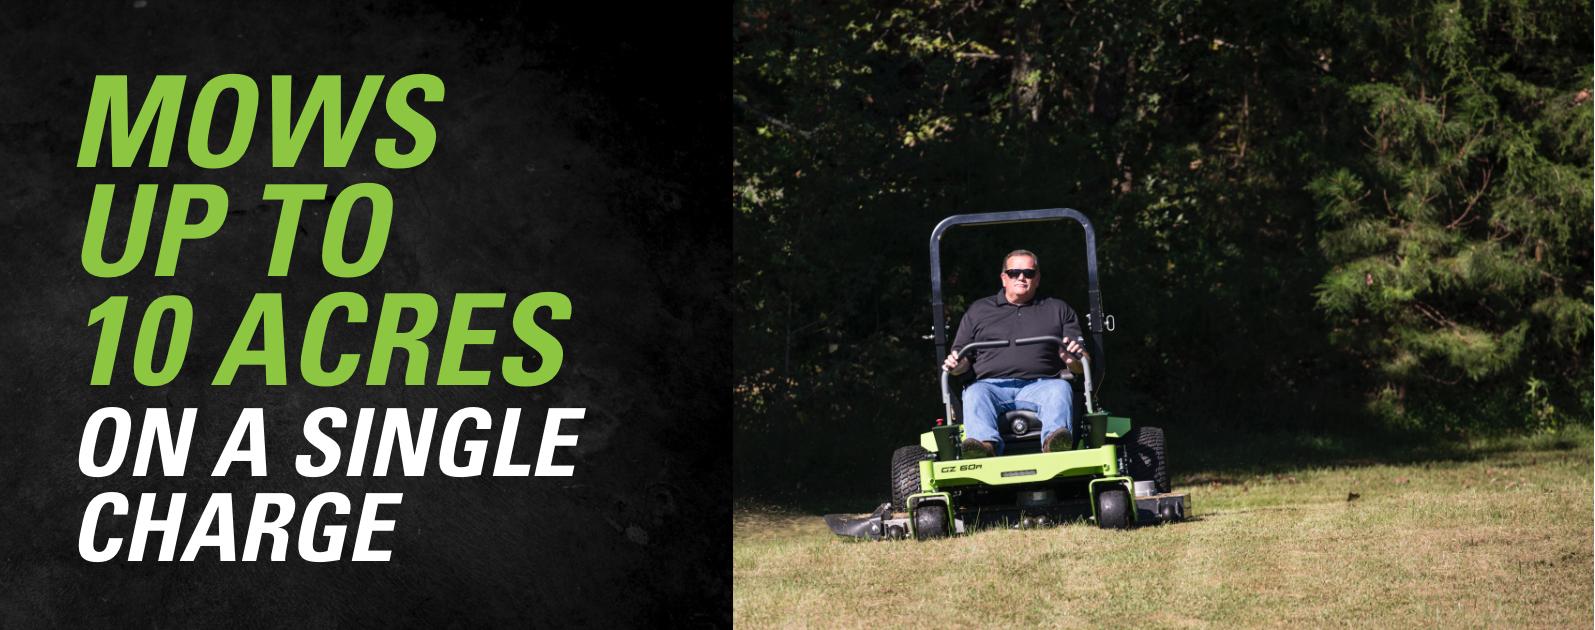 GZ60R 82 Volt Ride-On Zero Turn Mower | Greenworks Commercial